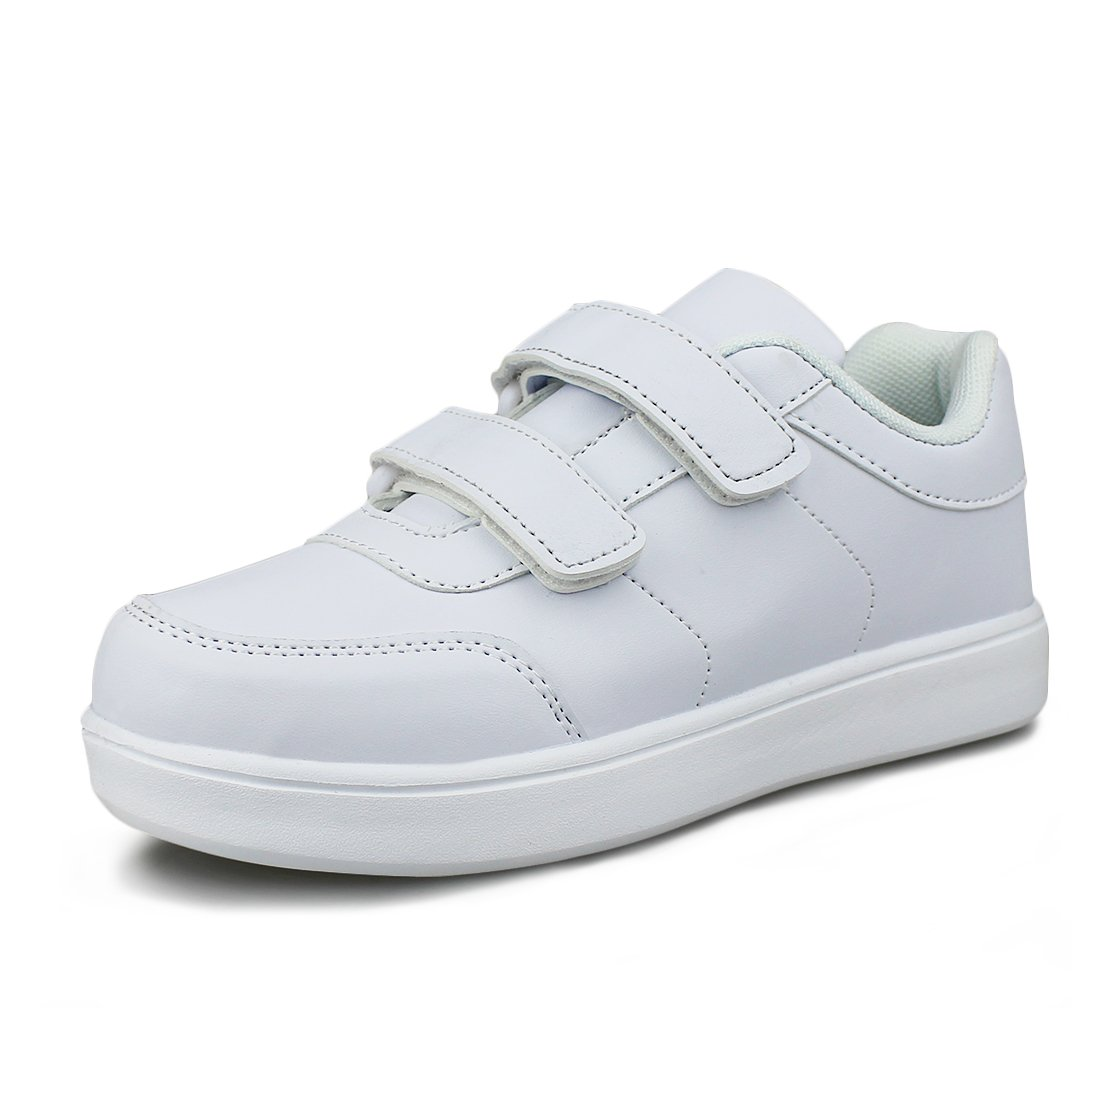 Hawkwell Kids School Uniform Sport Shoes(Toddler/Little Kid),White PU,10 M US